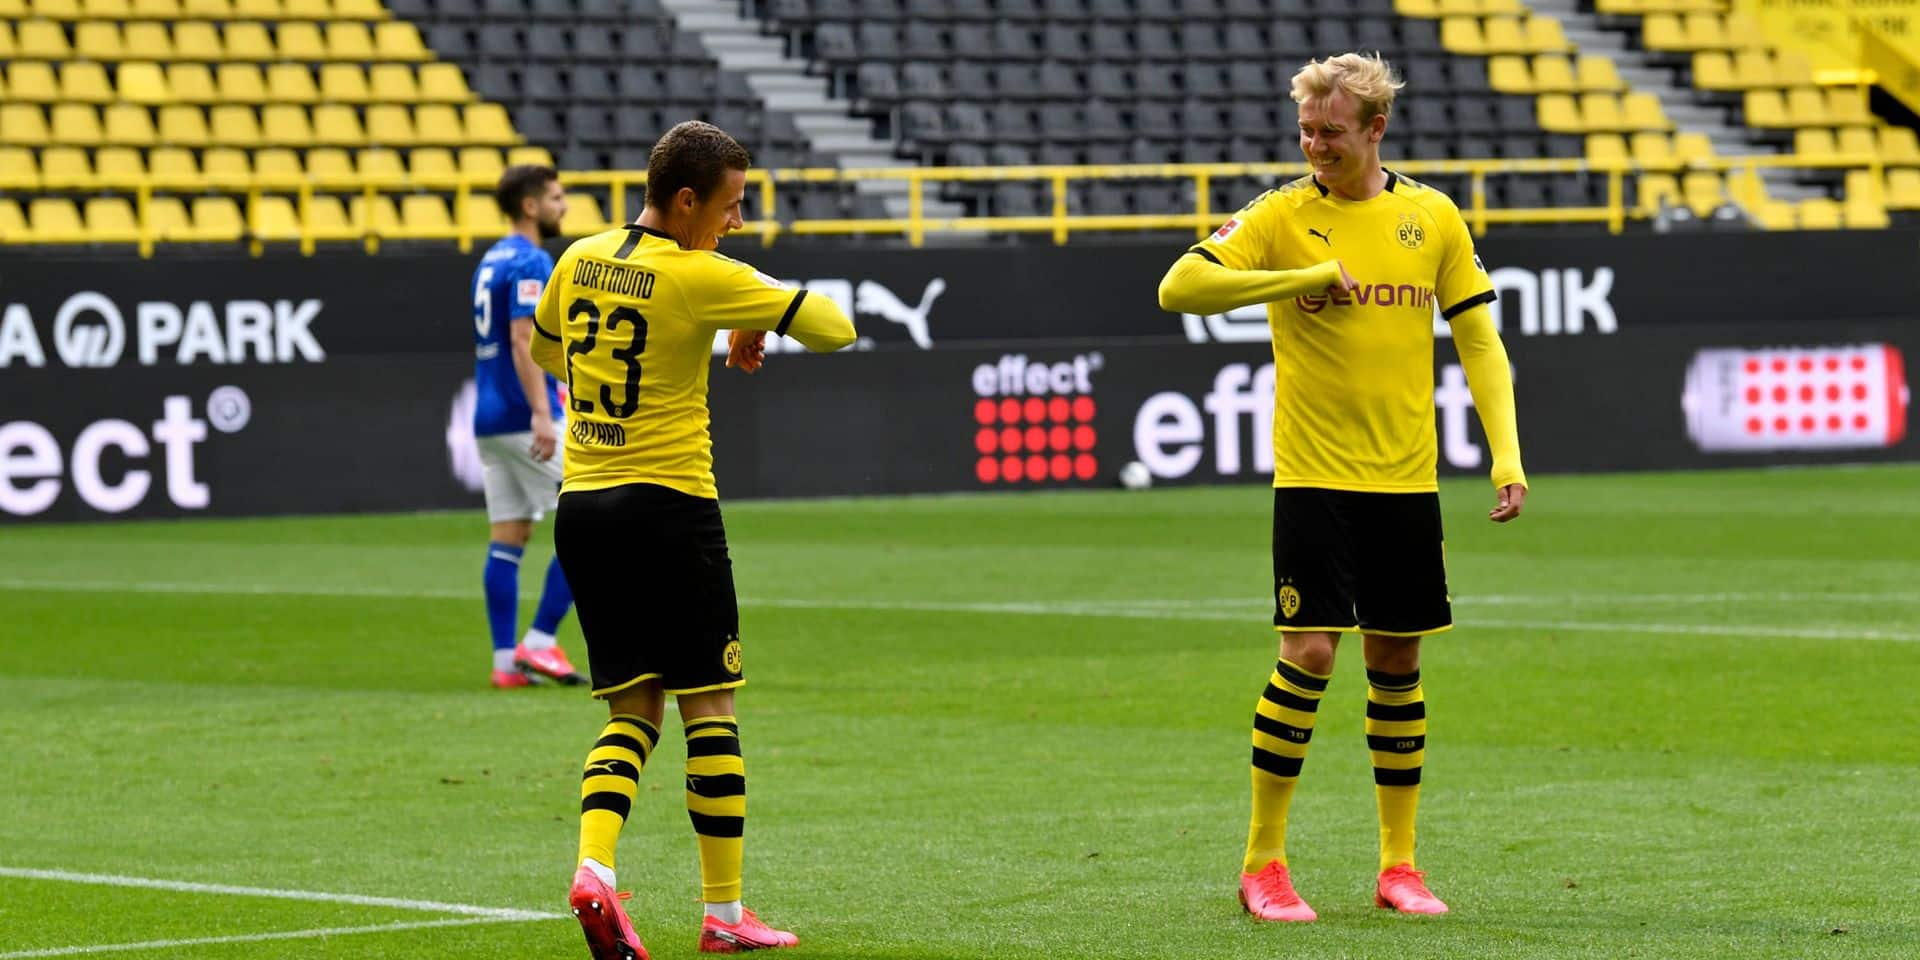 Wolfsburg-Dortmund, Gladbach-Leverkusen et Bayern-Francfort: suivez trois affiches de Bundesliga en direct vidéo dès 15h30